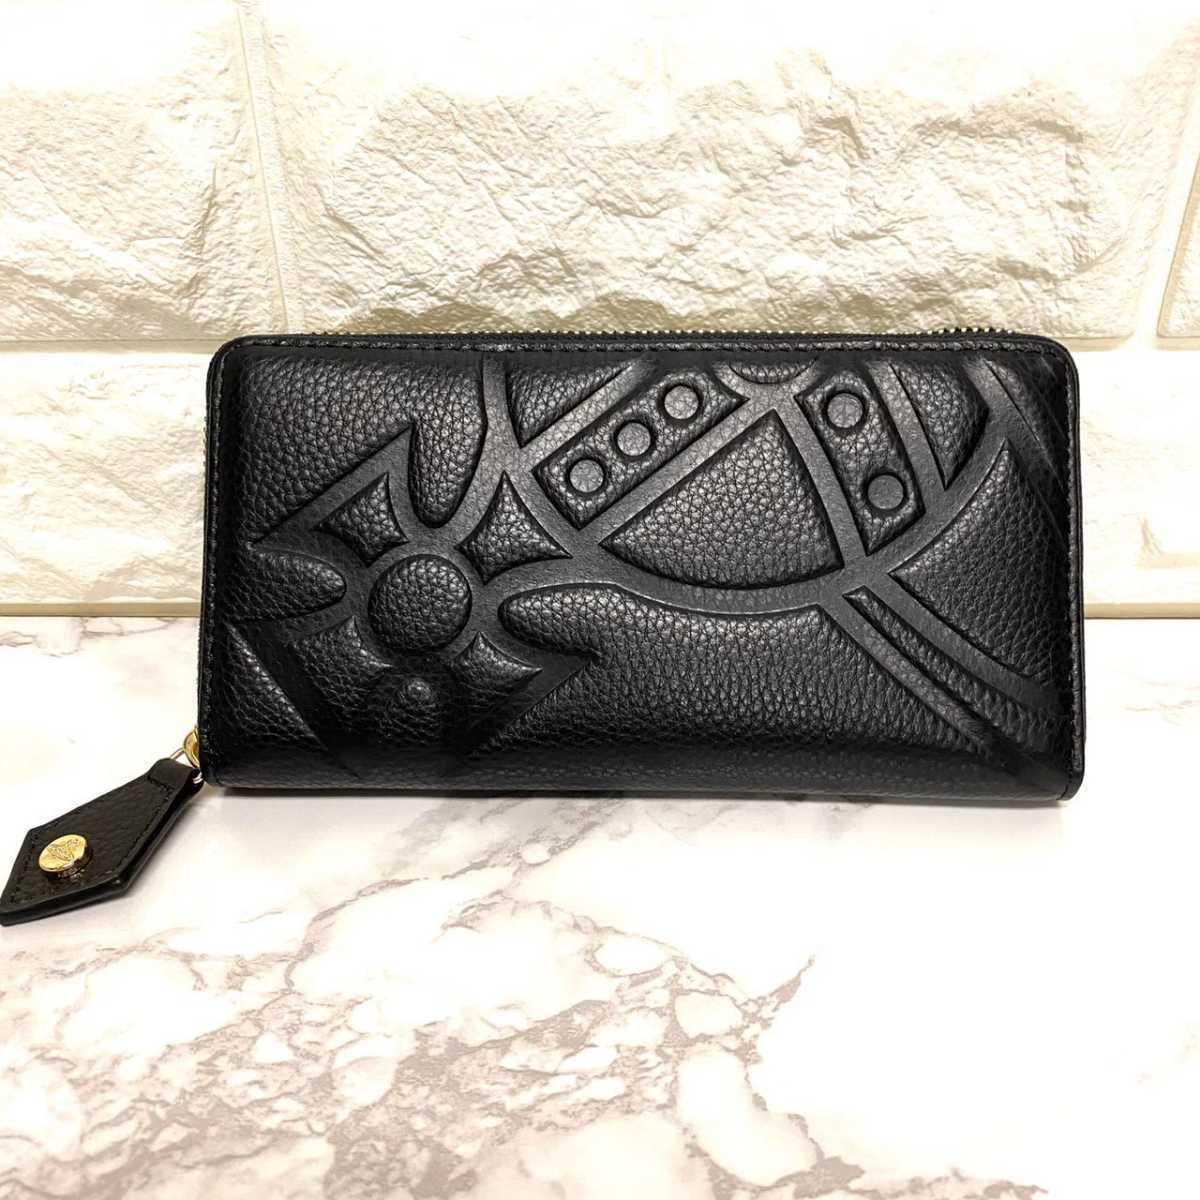 Vivienne Westwood ヴィヴィアン・ウエストウッド 長財布 ラウンドファスナー 黒 ブラック レザー デカロゴ エンボス メンズ レディース